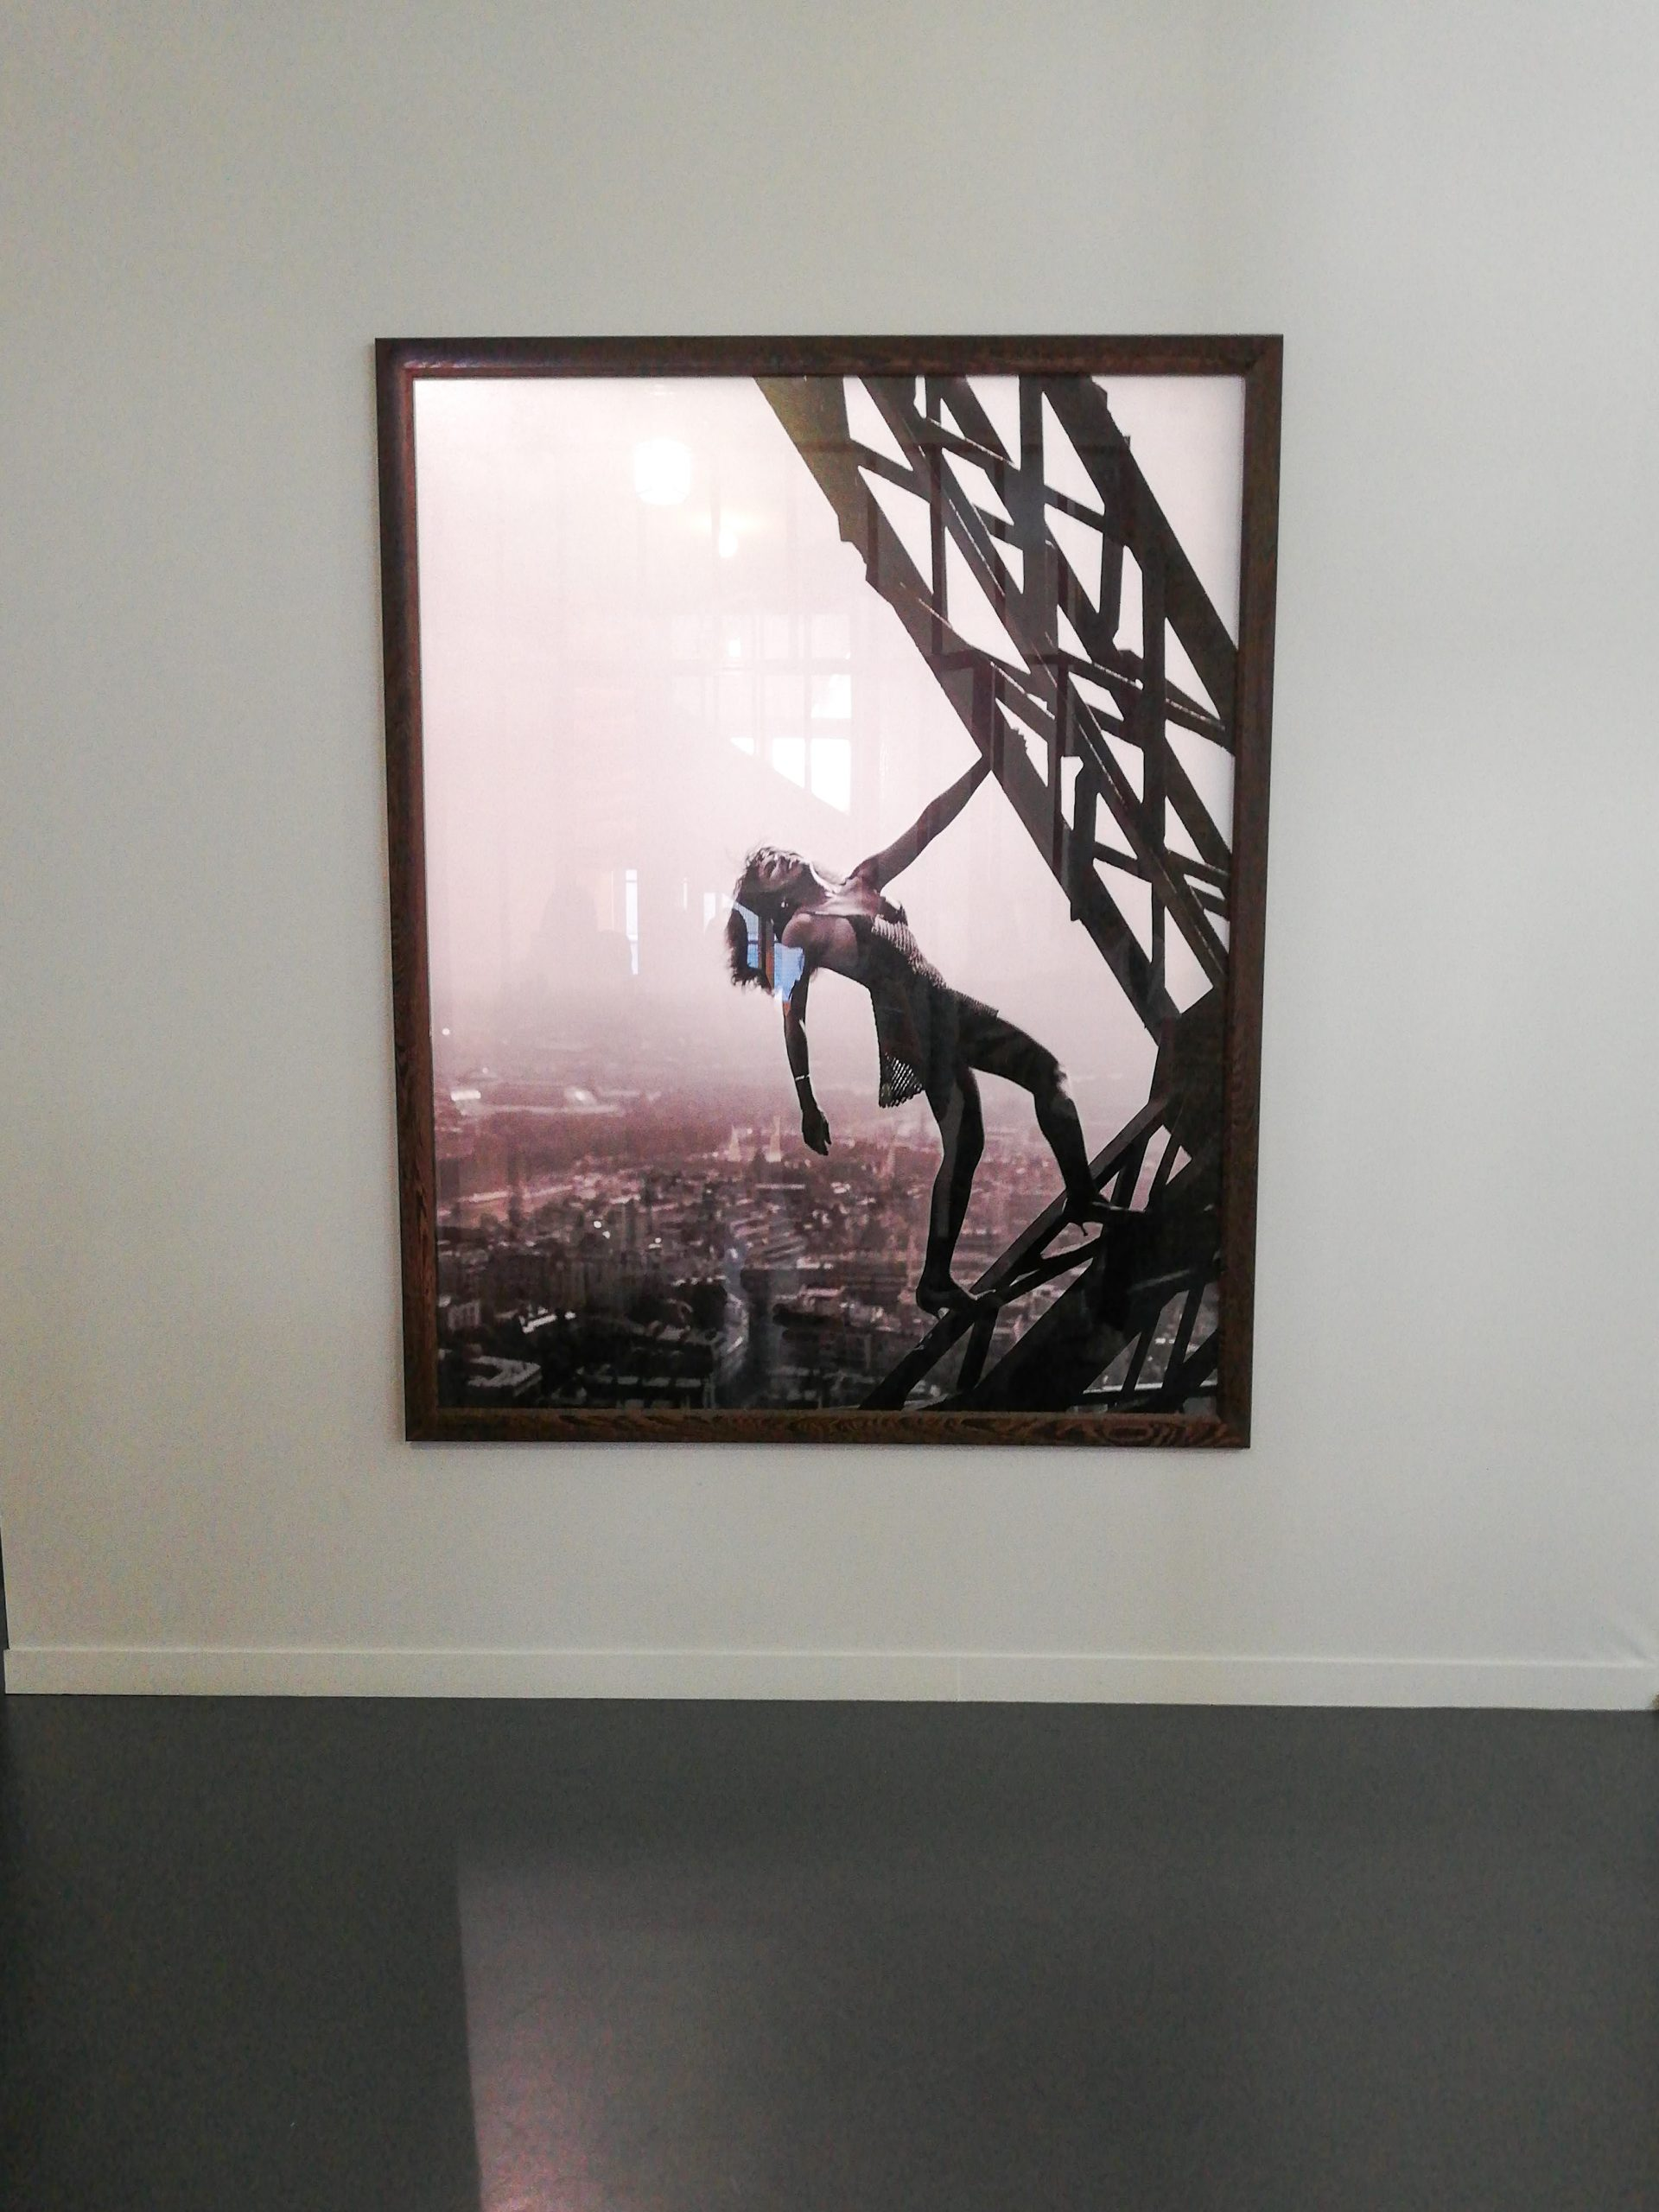 Tina Turner Climbing the Eiffel Tower